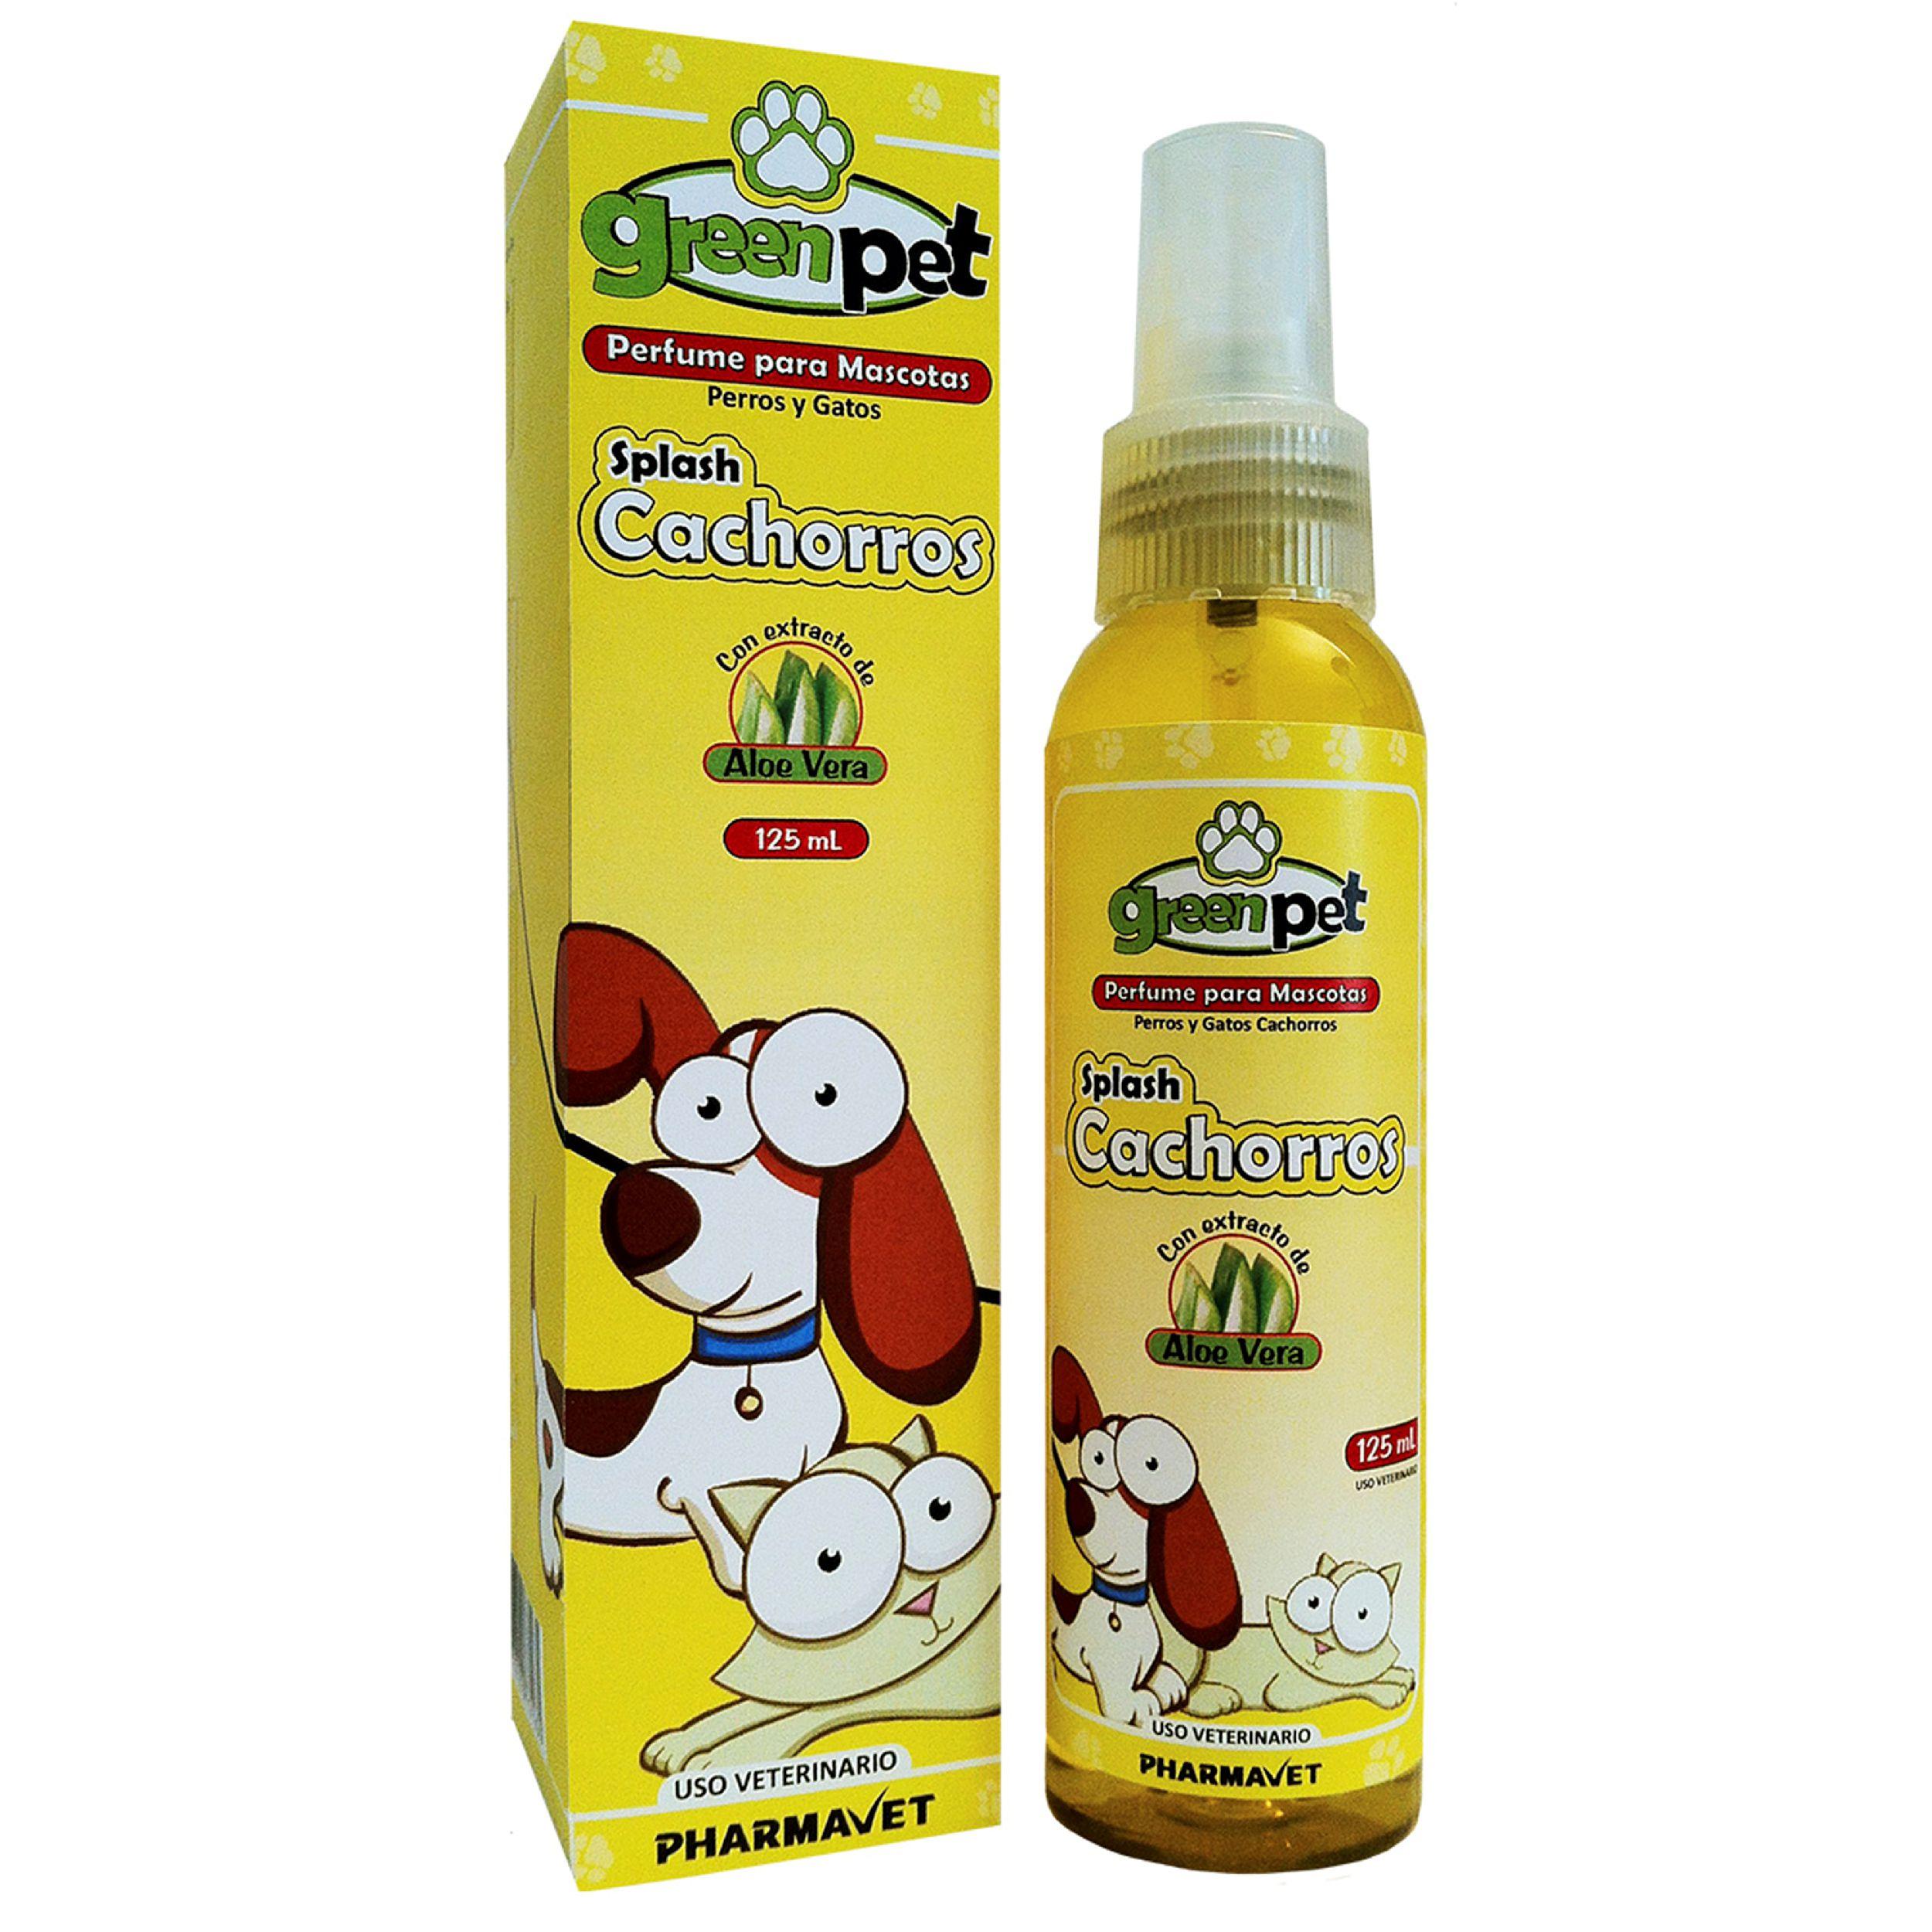 Perfume Cachorros.jpg